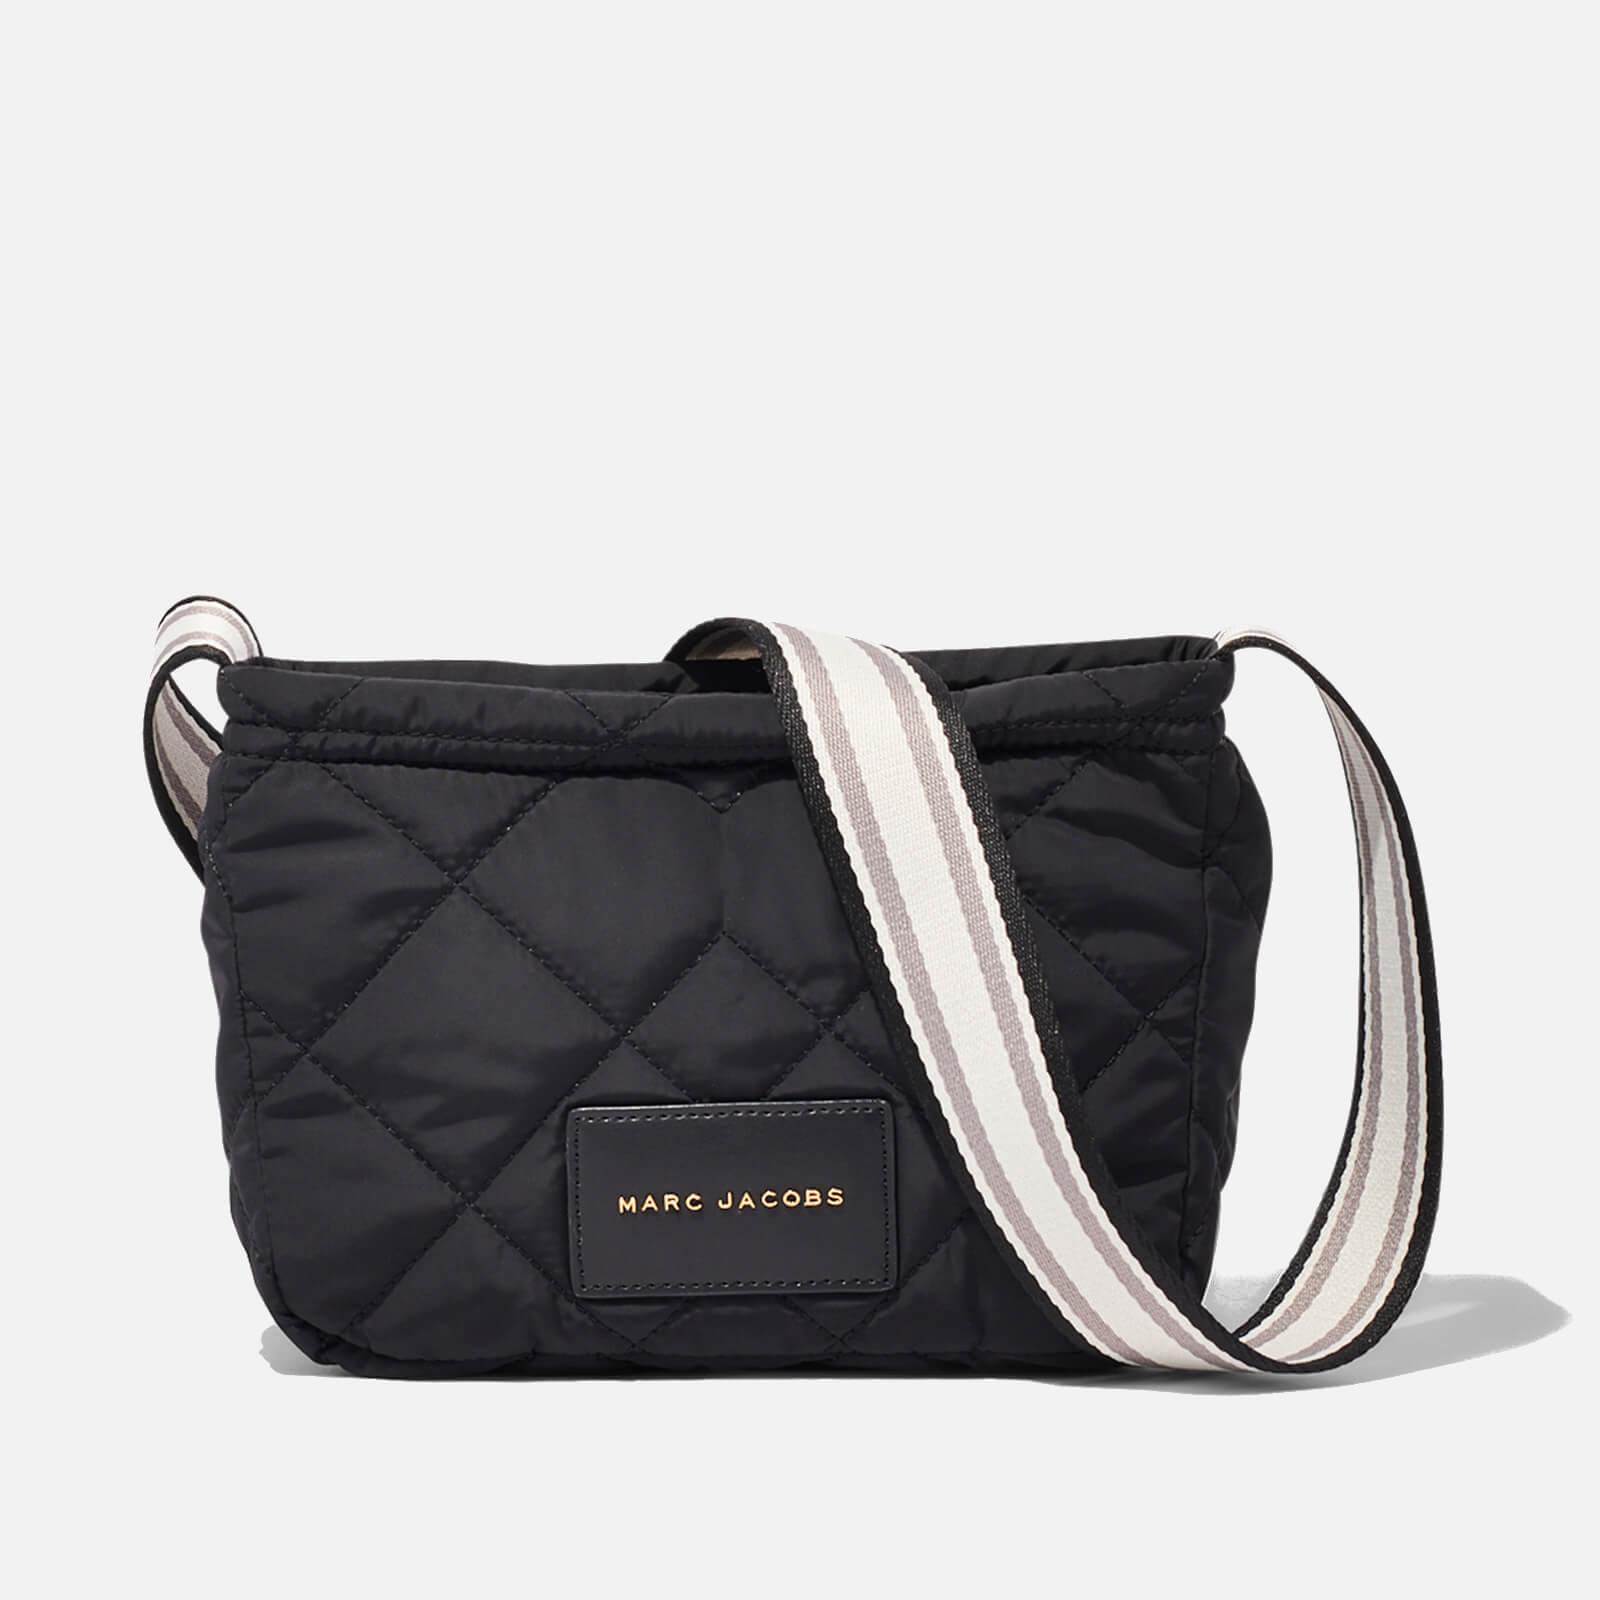 Marc Jacobs Women's Essentials Messenger Bag - Black